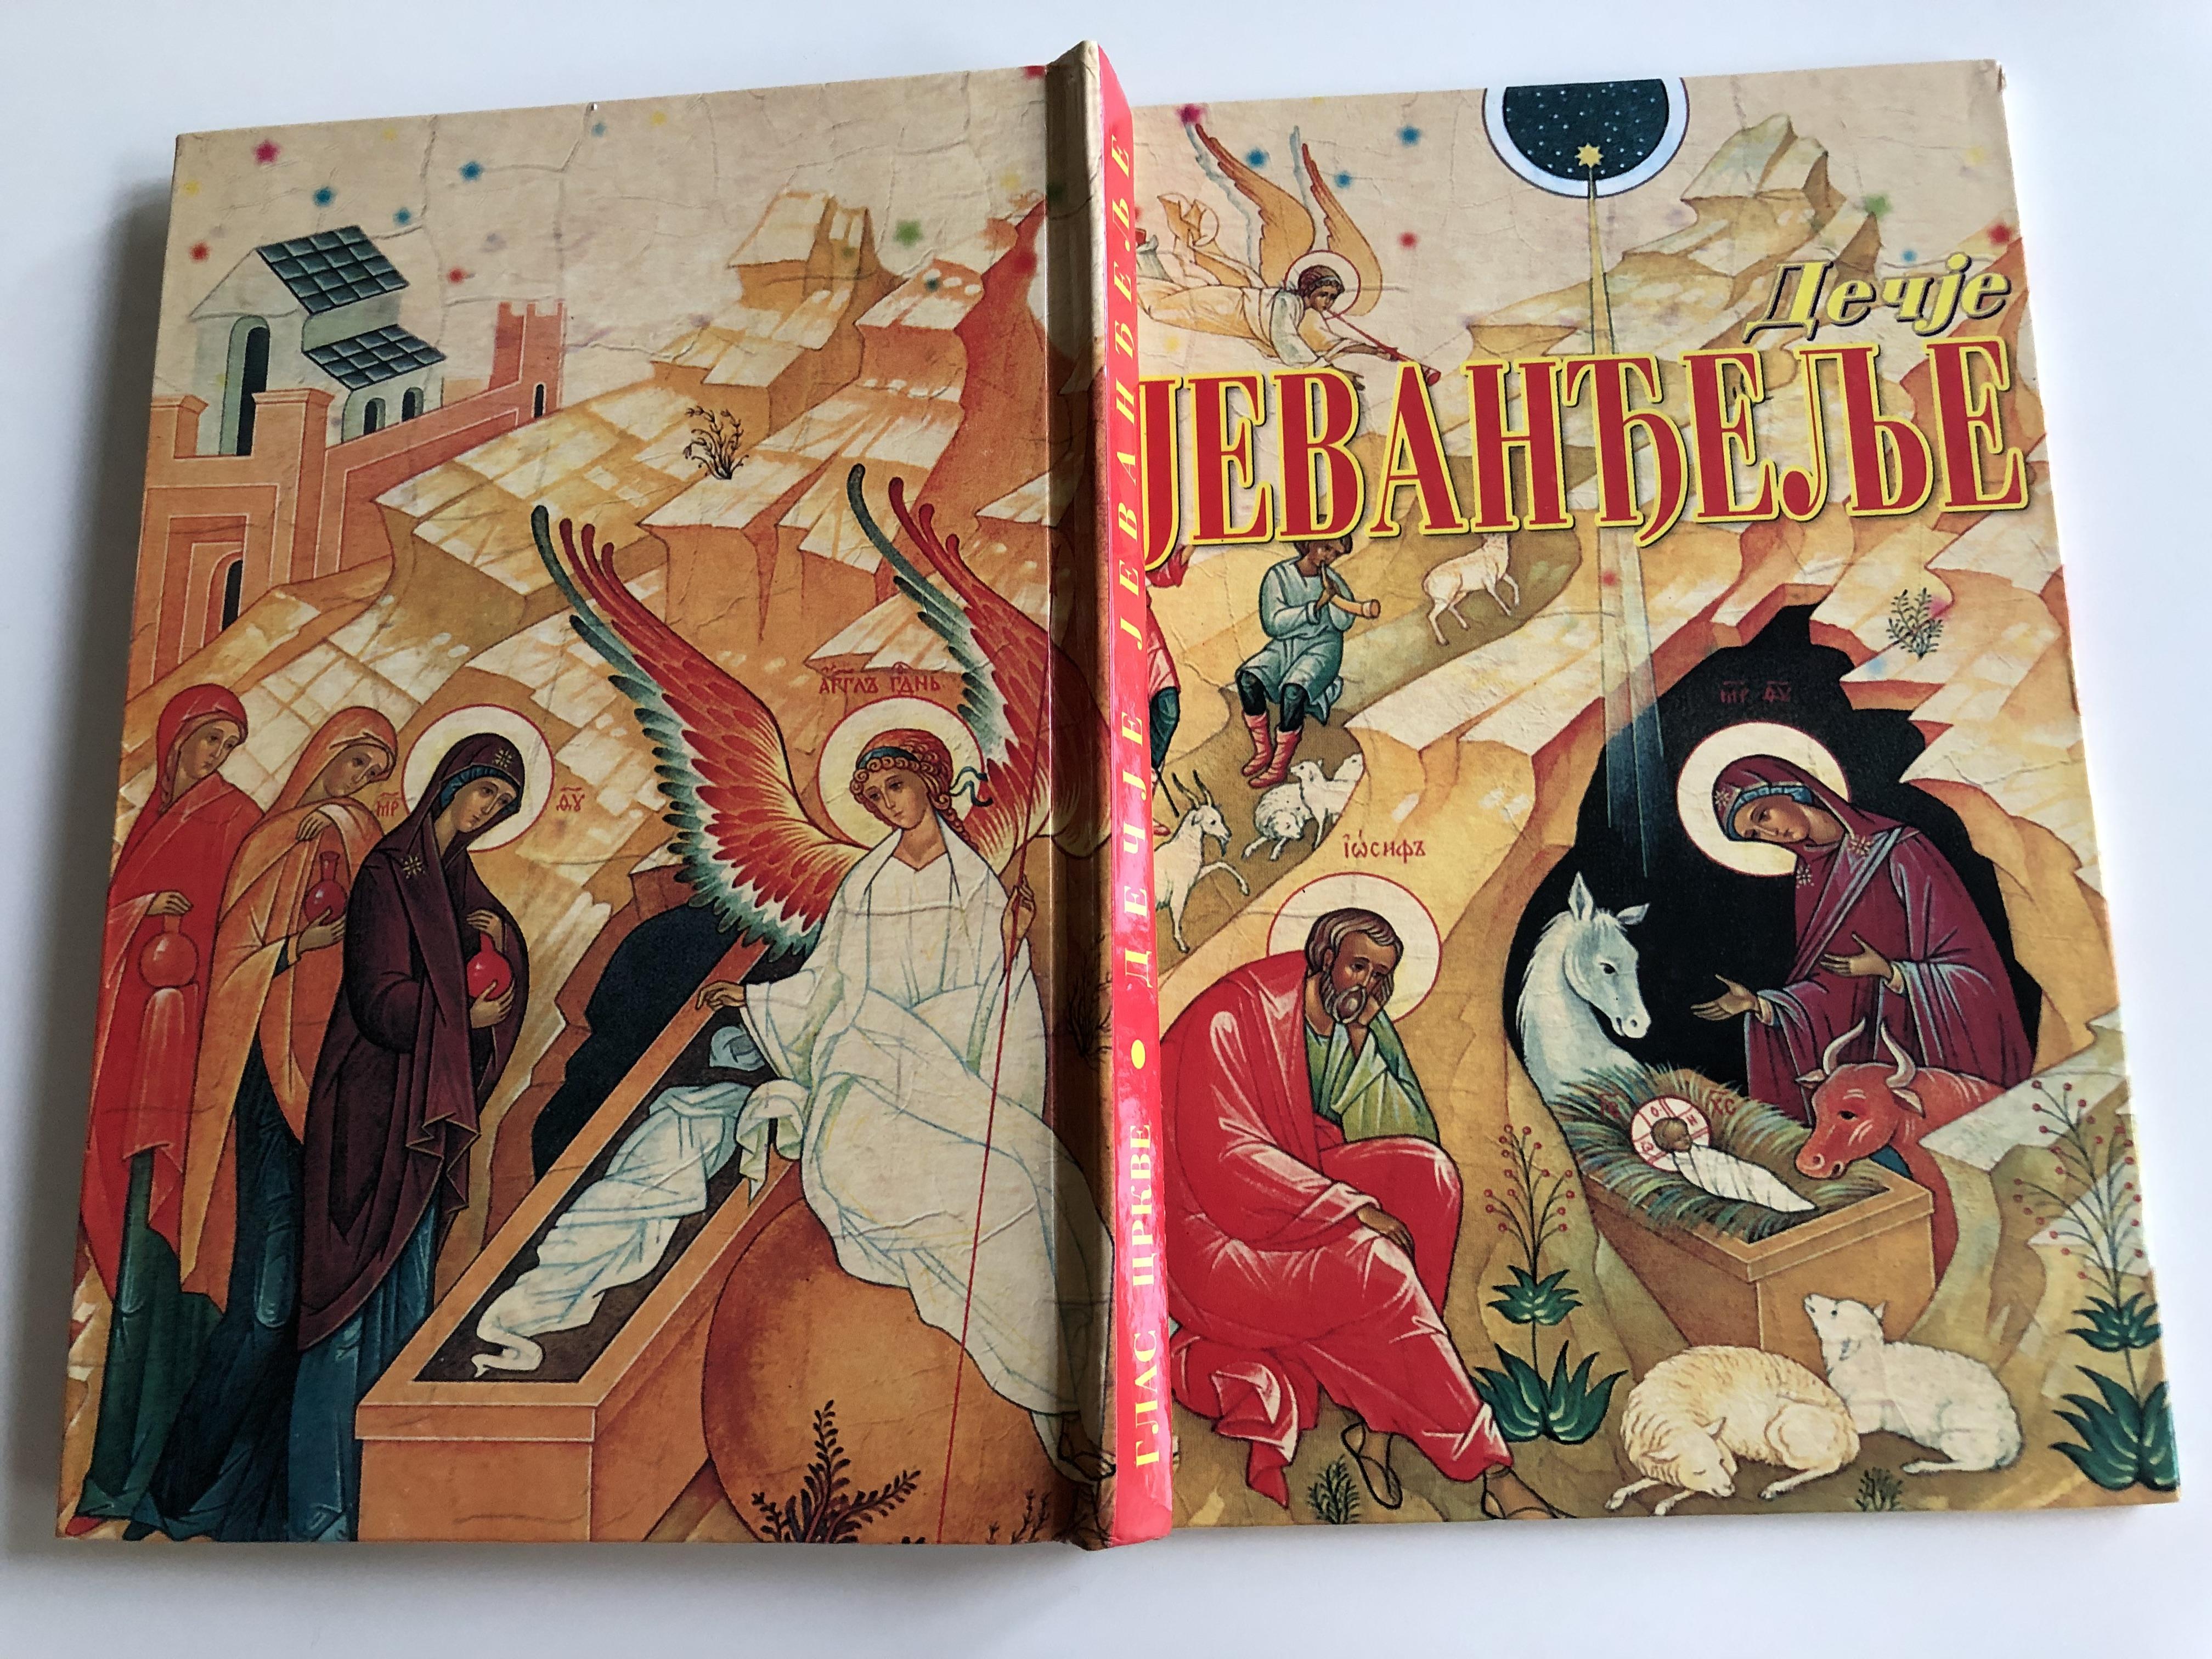 -serbian-orthodox-children-s-gospel-by-ljubomir-rankovic-hardcover-small-size-glas-crkve-2004-15-.jpg